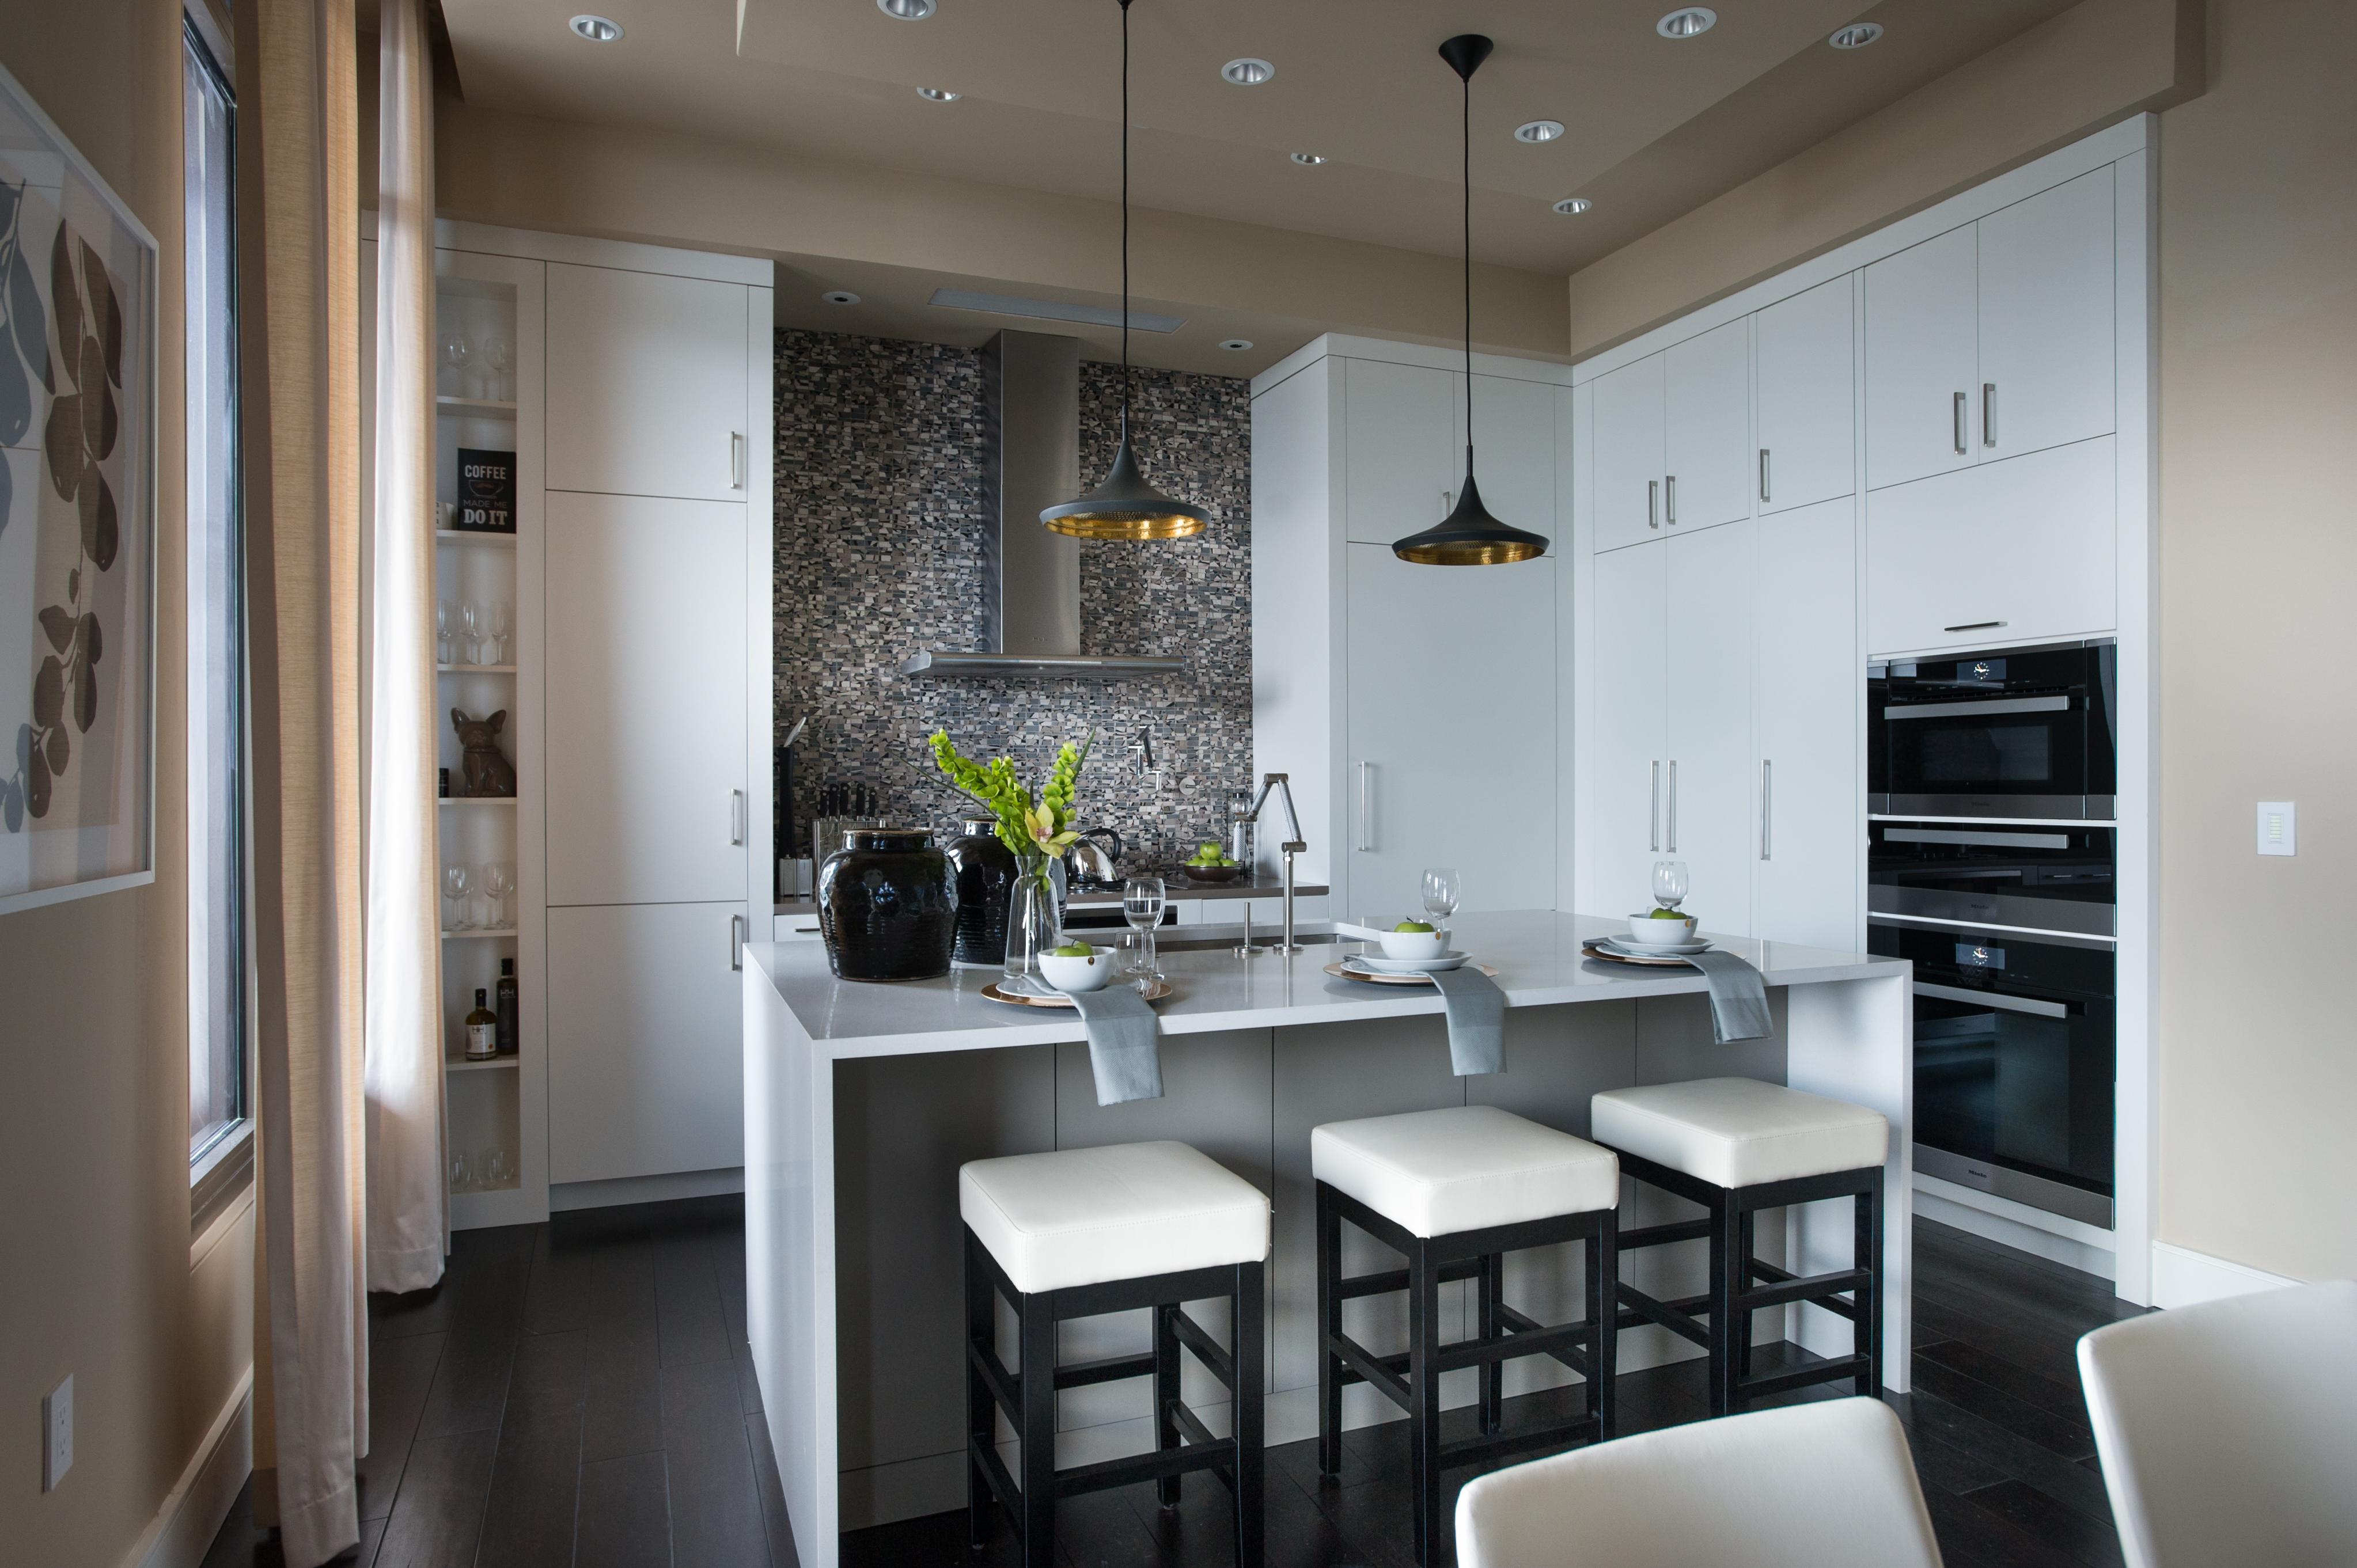 3 Things to Consider When Choosing Recessed Lighting - Craftsman ...